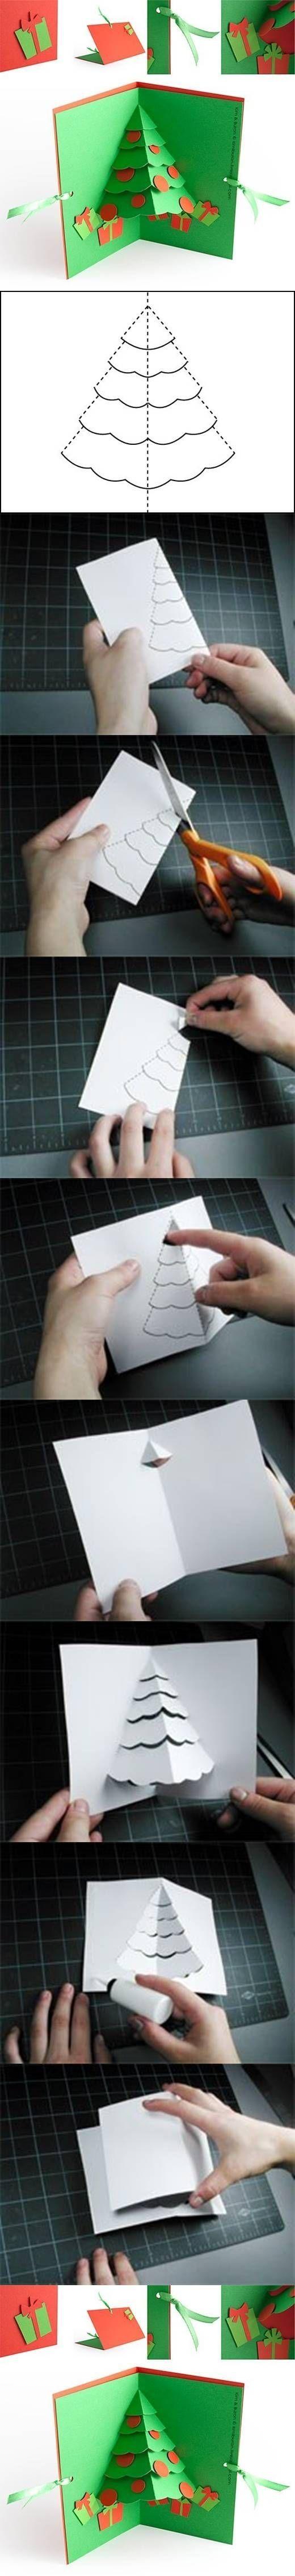 #DIY Christmas tree Pop Up Card #crafts by KMadzz